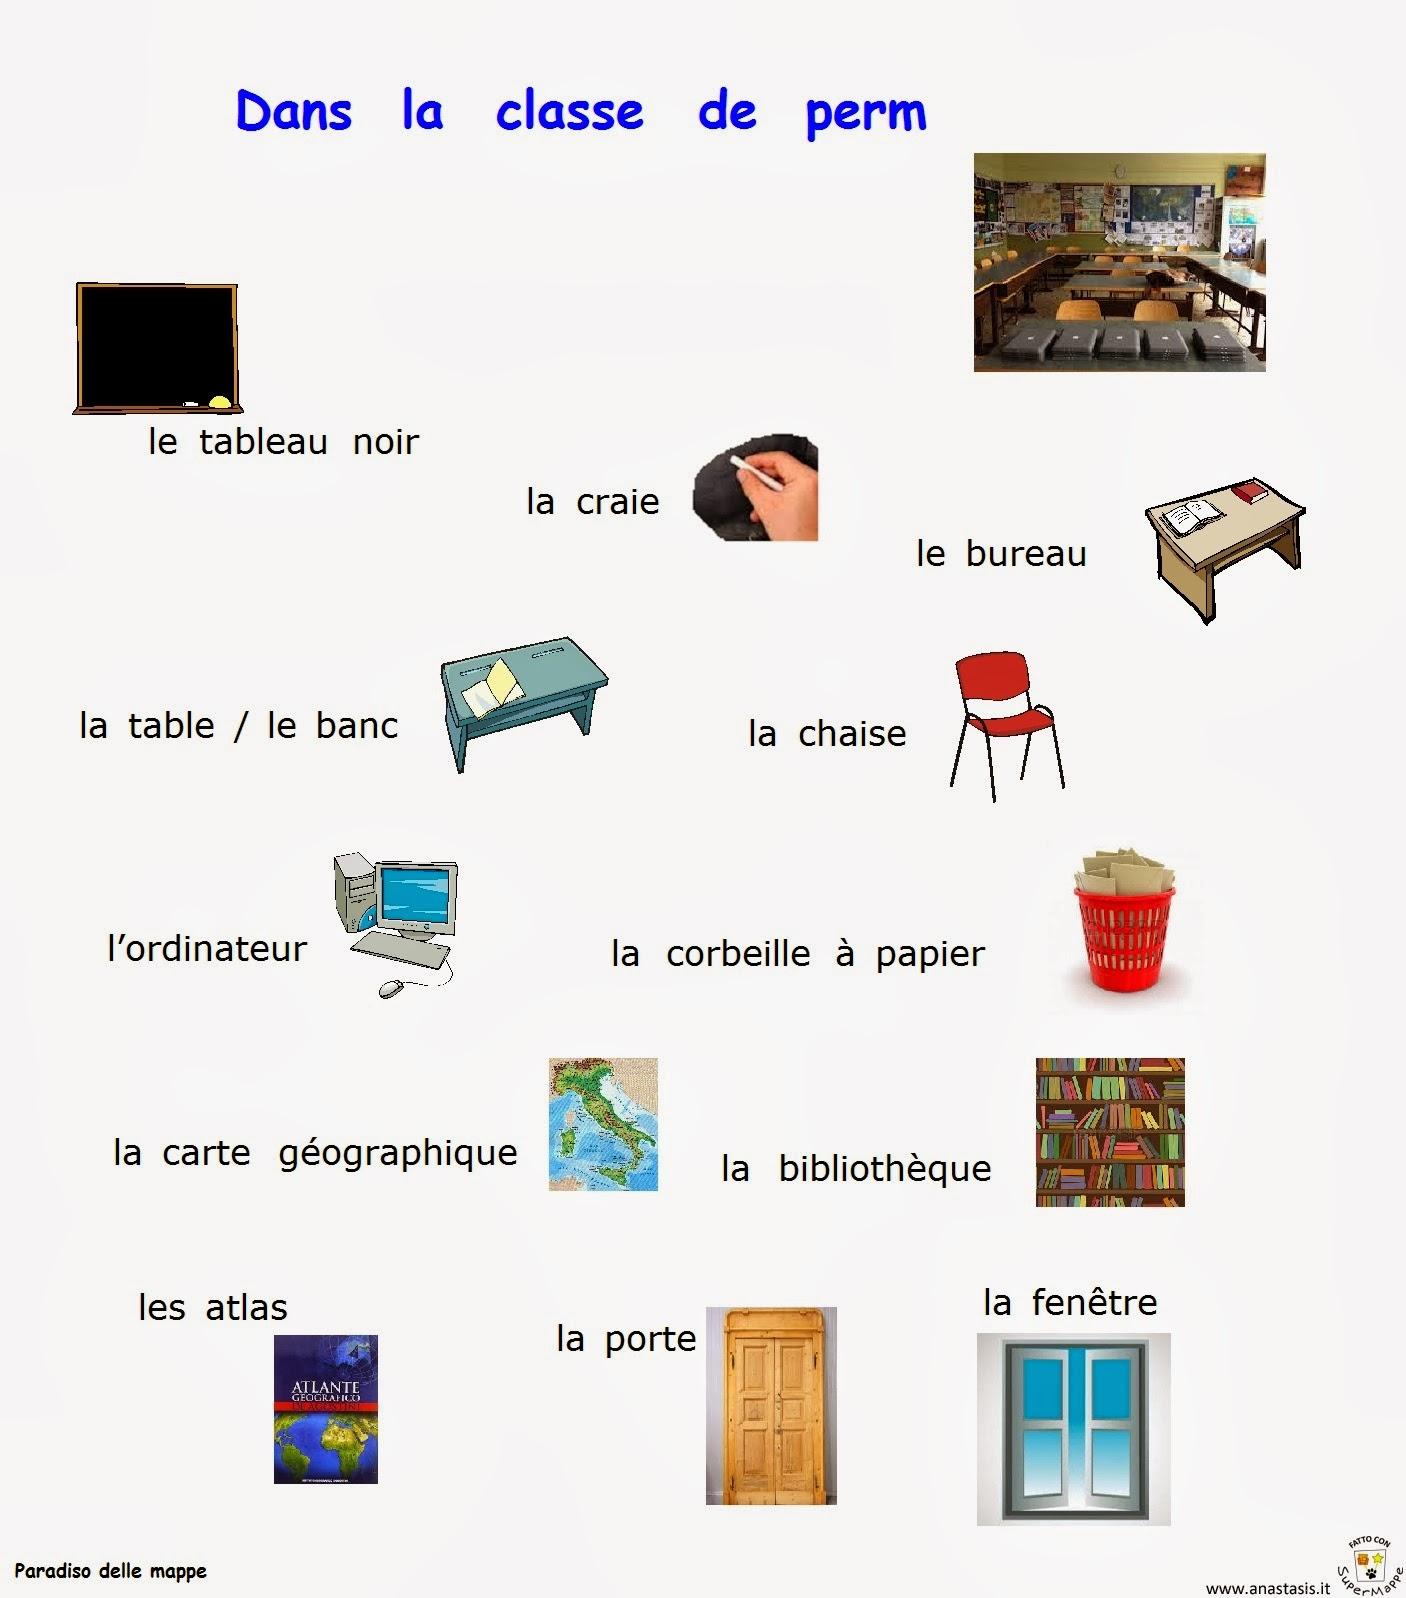 Paradiso delle mappe dans la classe de perm for Design della casa francese